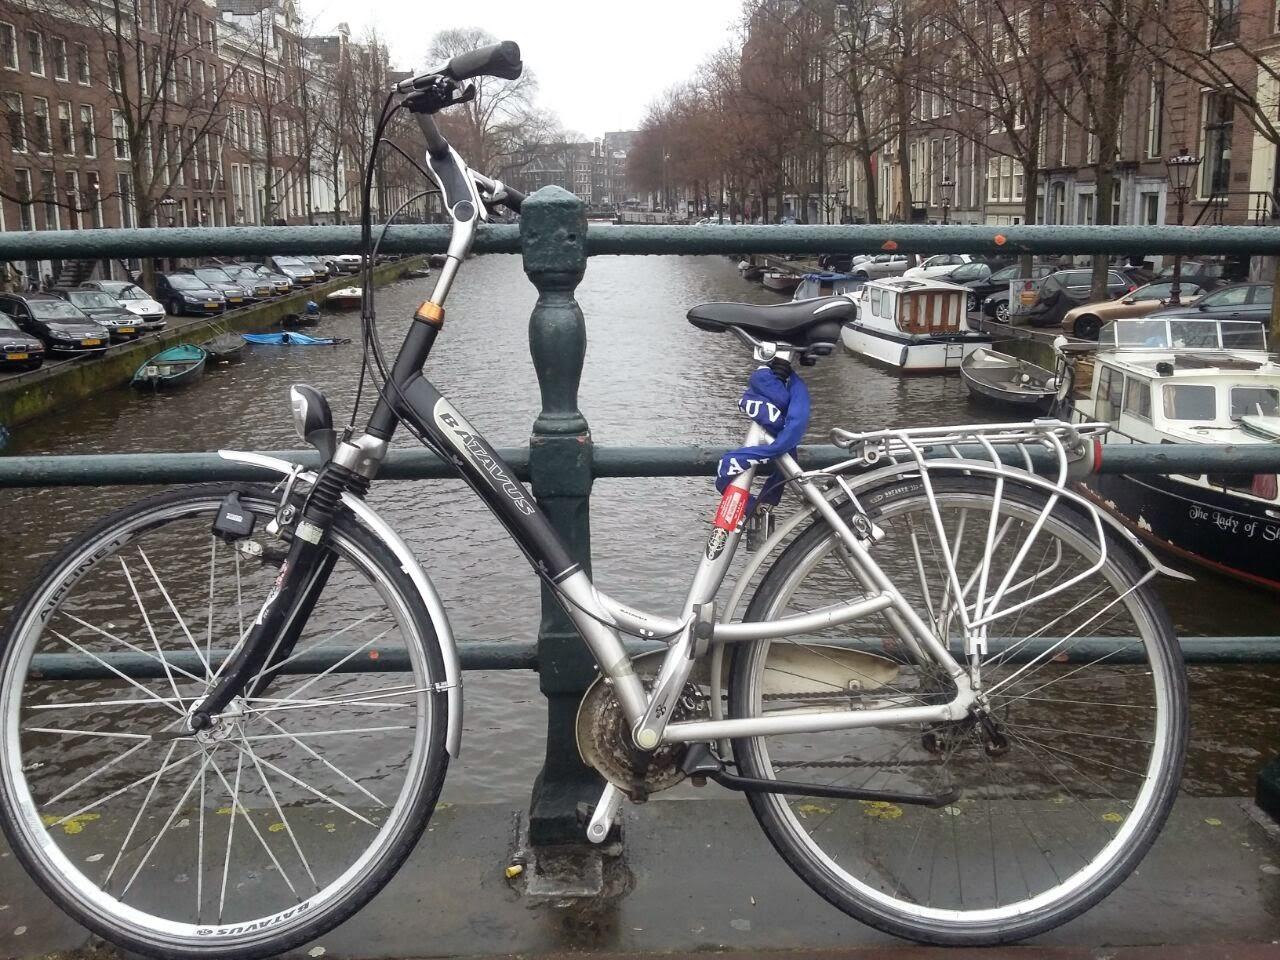 Sepeda yang terparkir